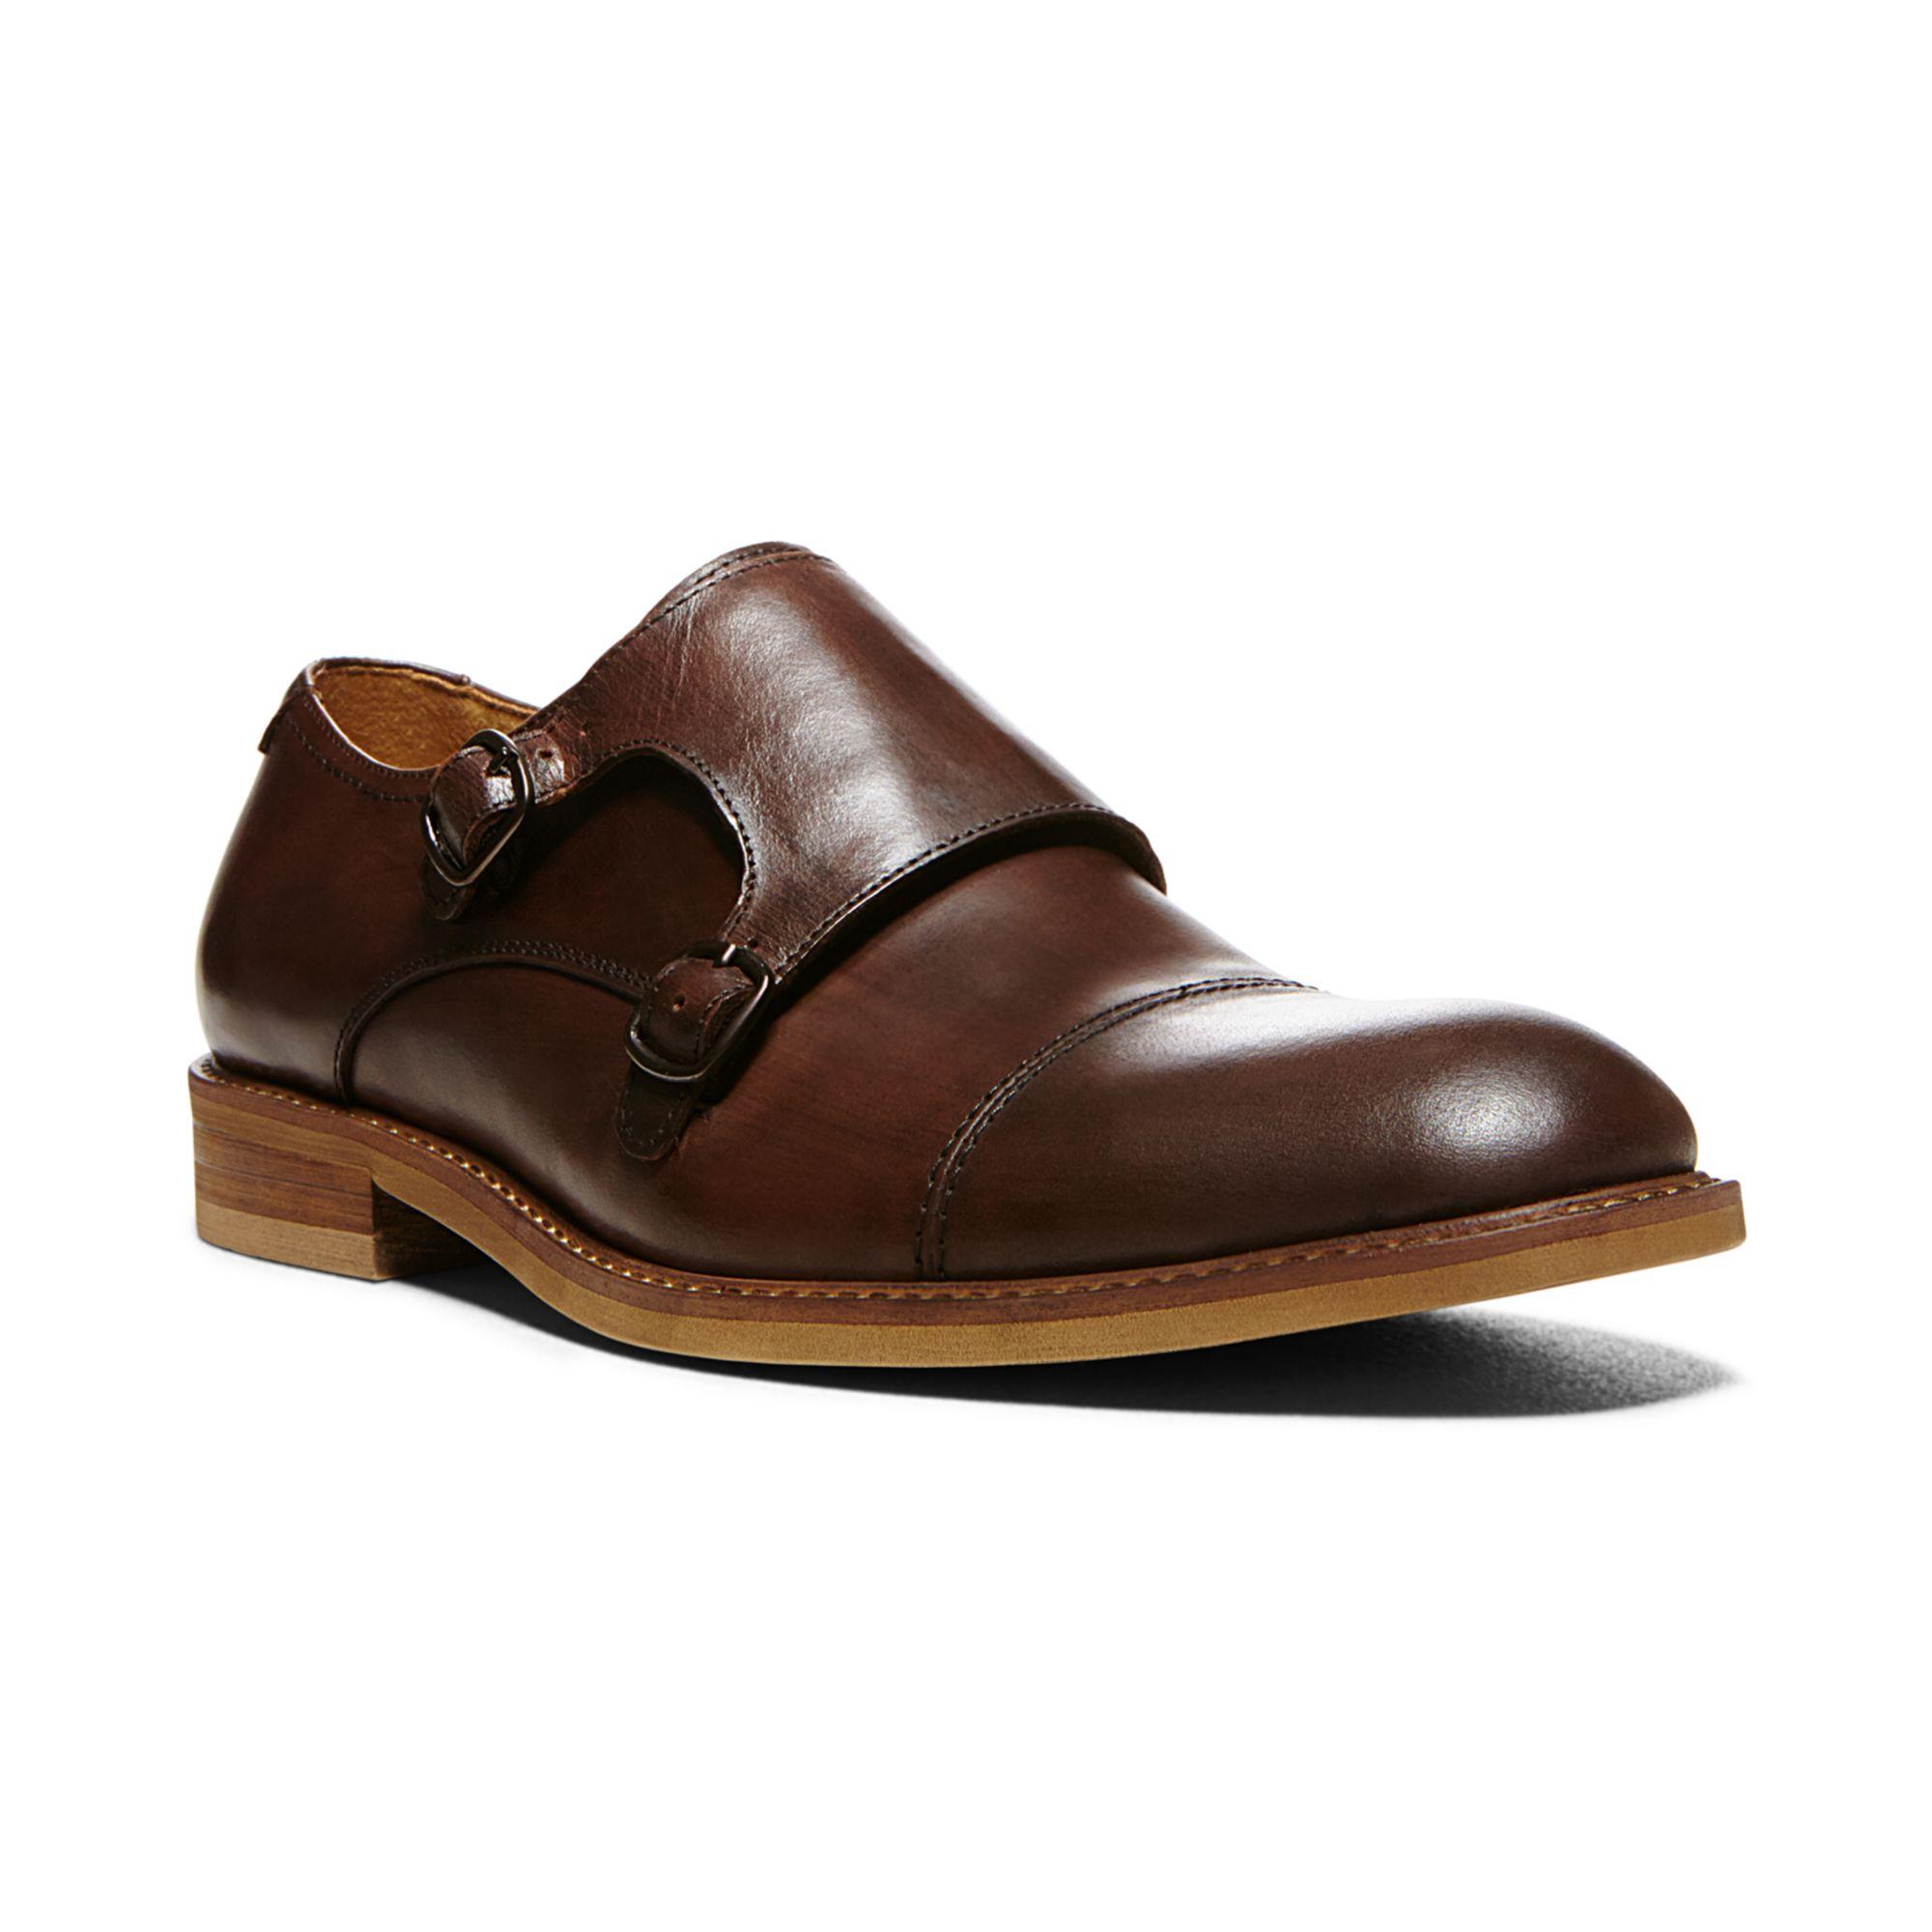 Mens leather gloves boss - Steve Madden Runnit Monk Strap Shoes In Brown For Men Lyst